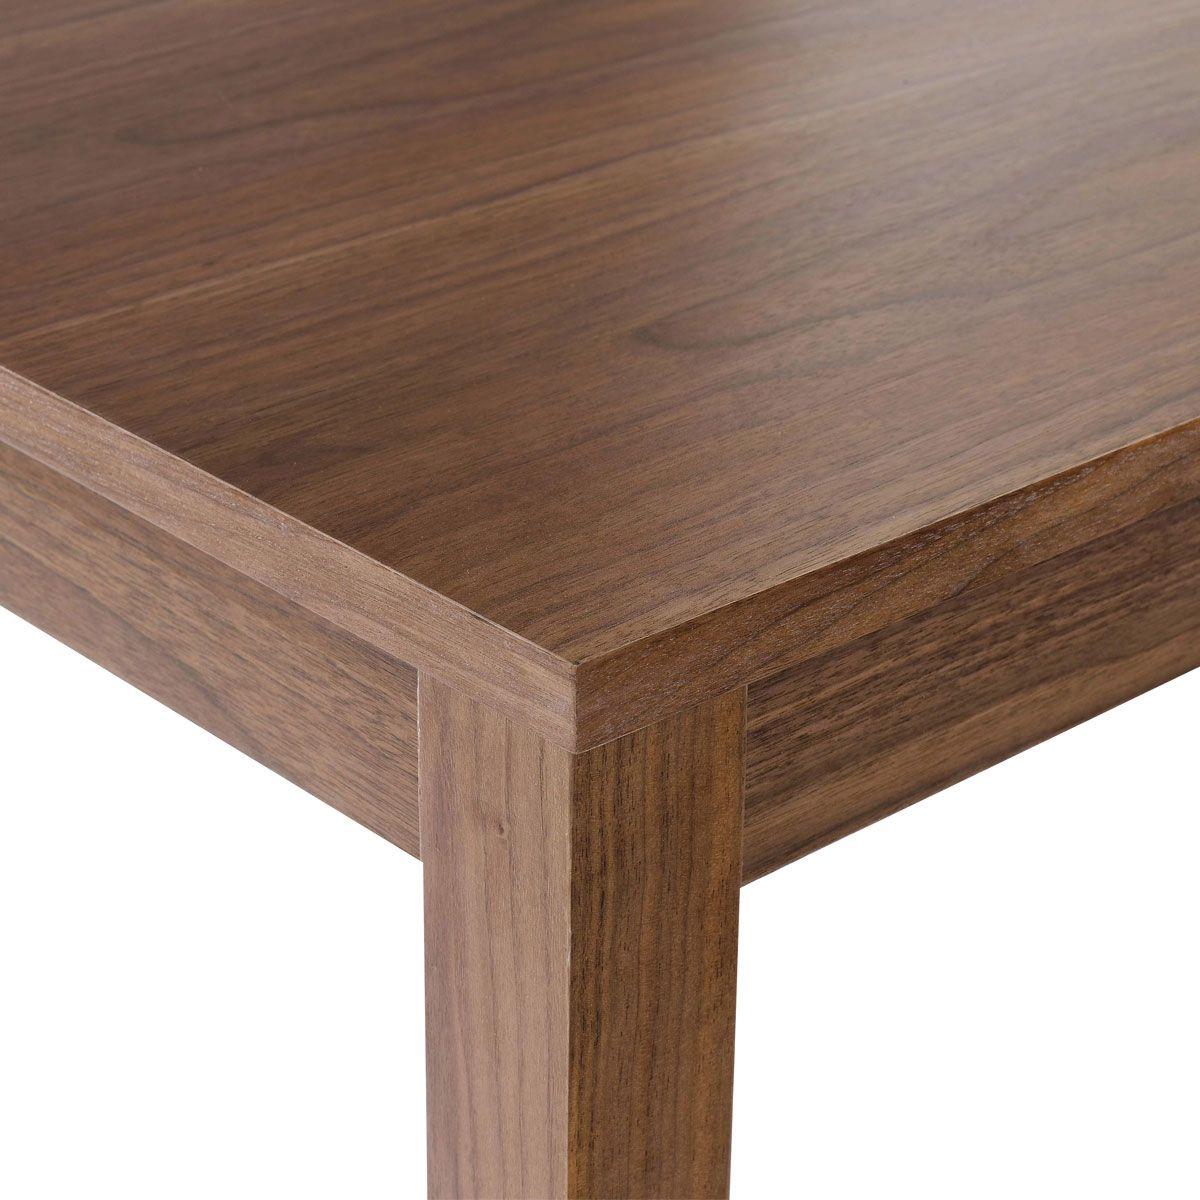 Ikea Birch Dining Chairs